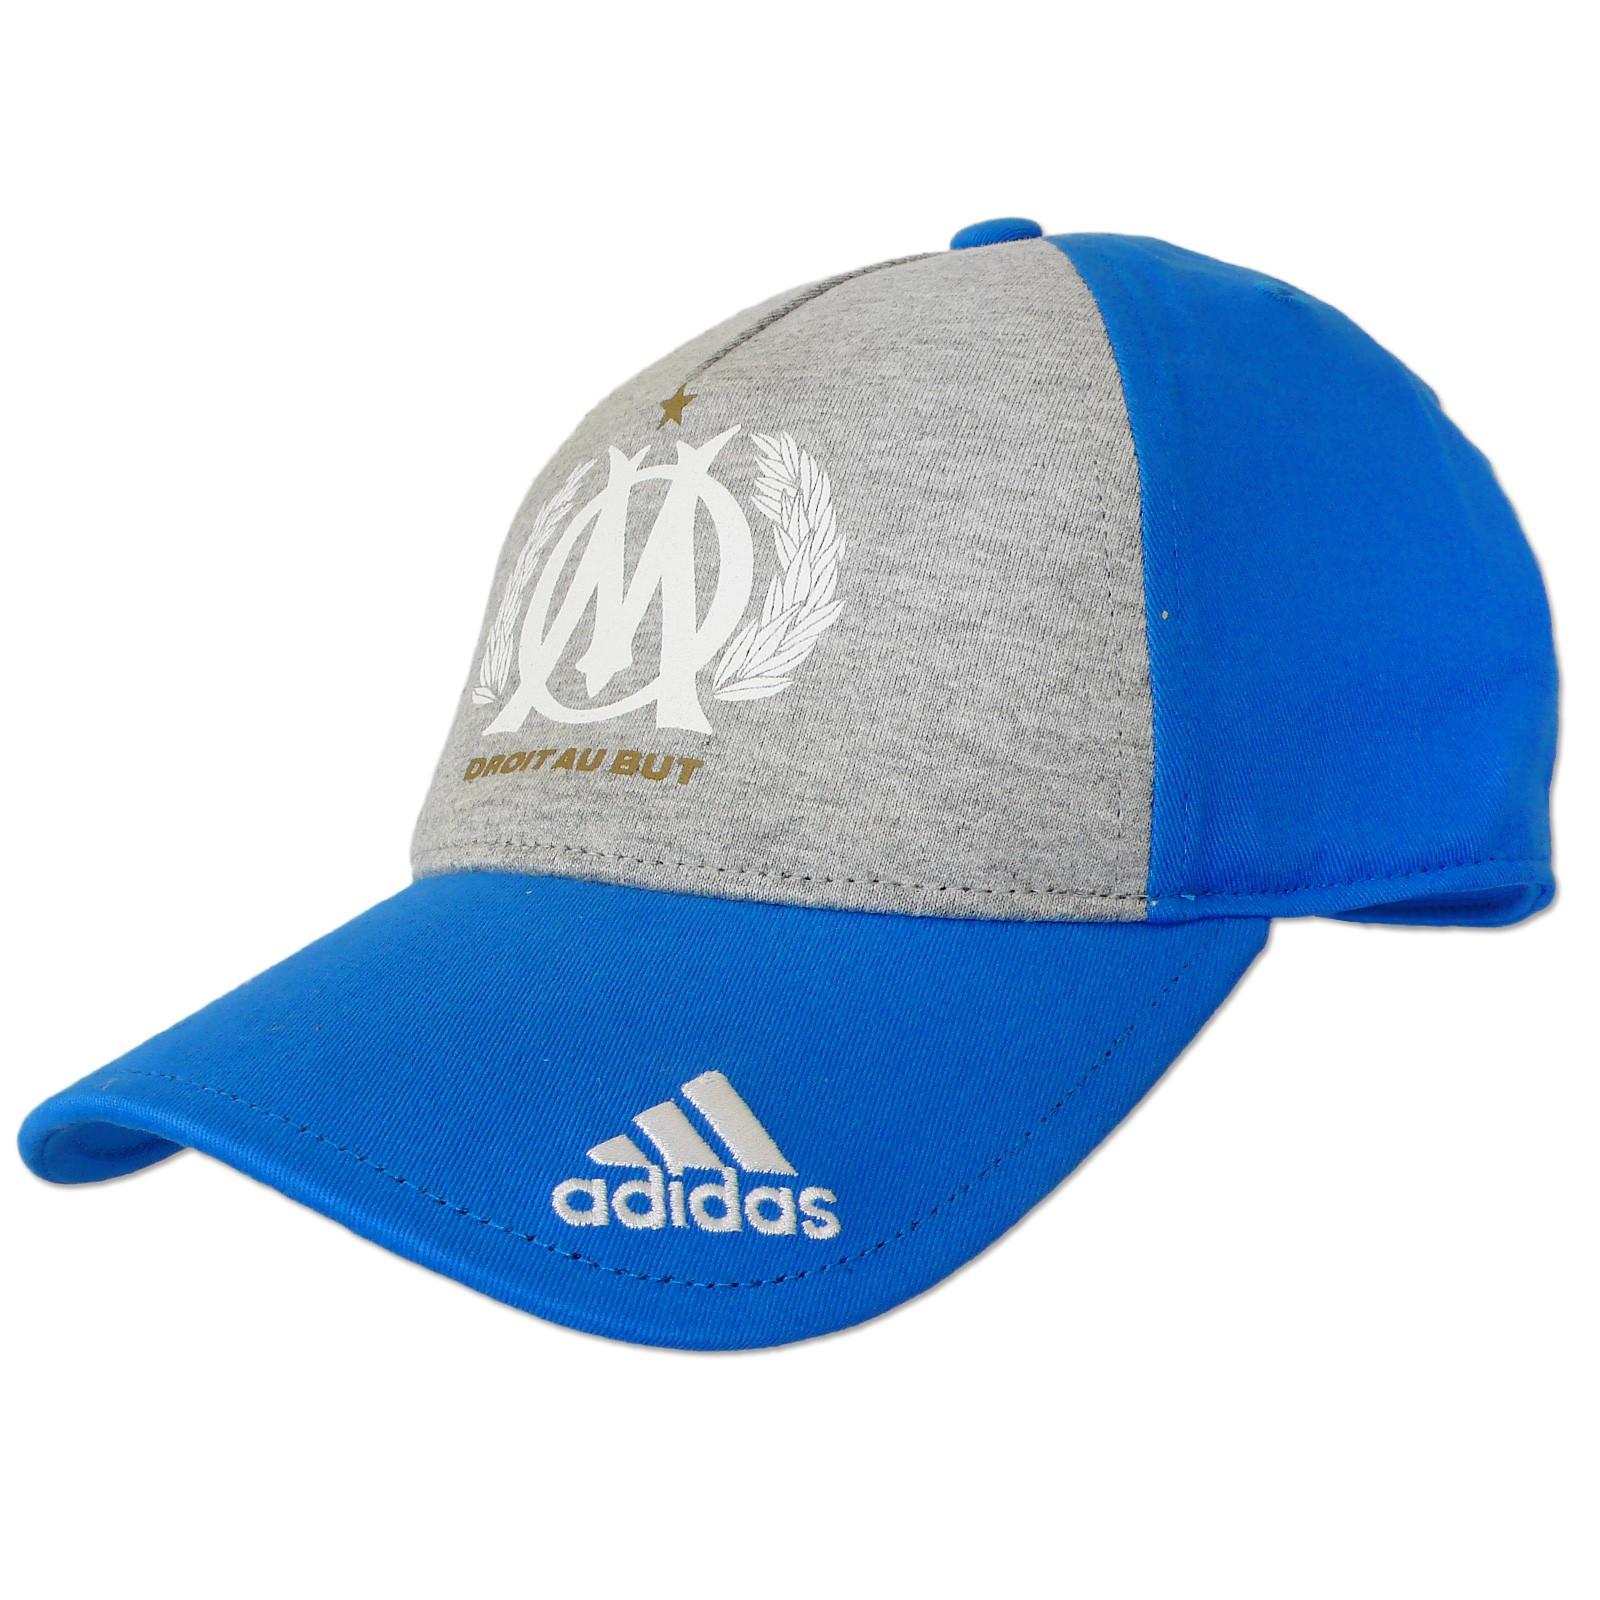 Adidas Om Club Cap Olympique Marseille Men M Tze Osfm Blau